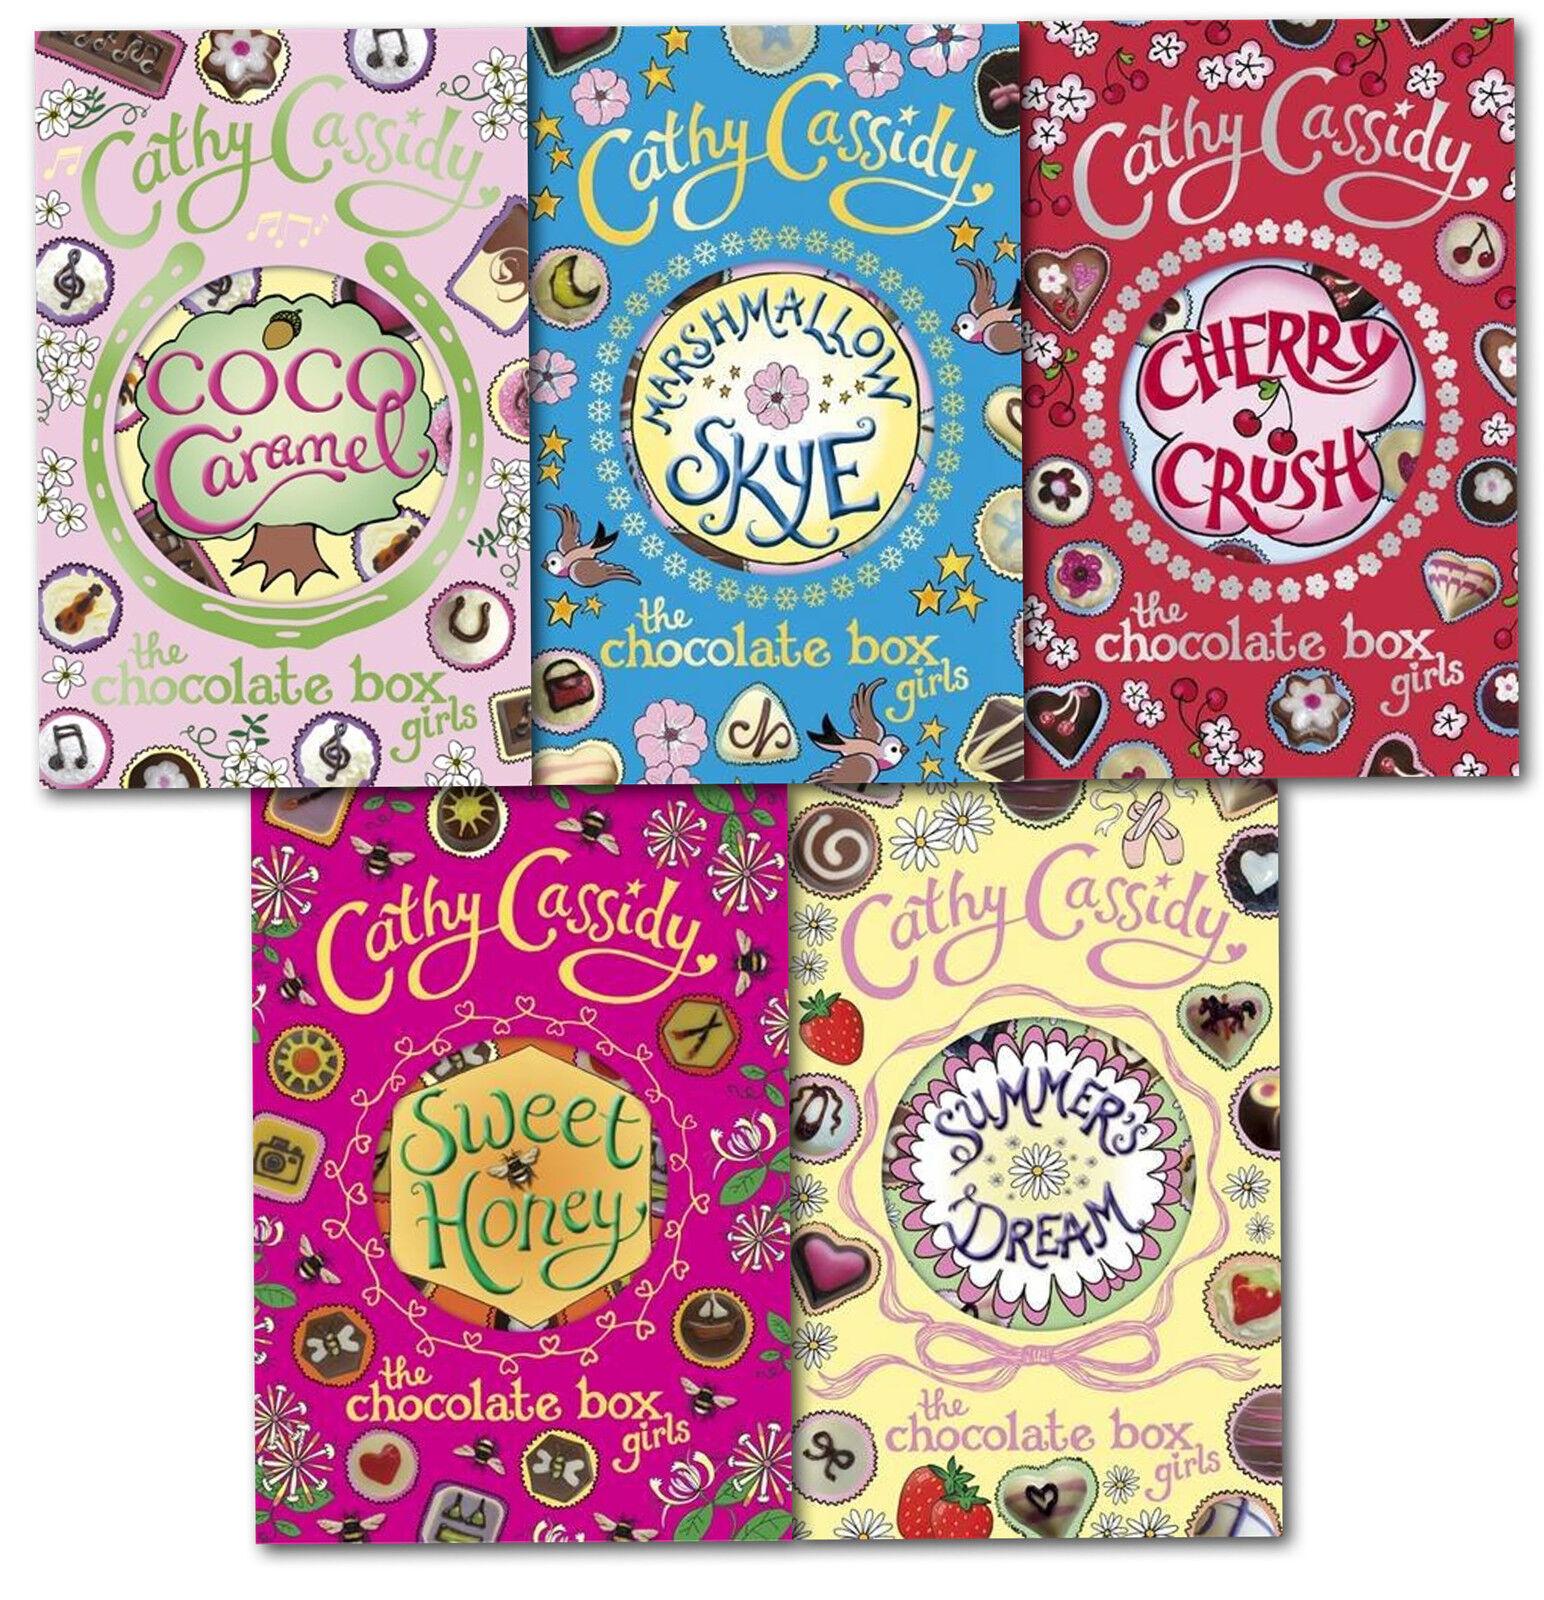 Cathy Cassidy Chocolate Box